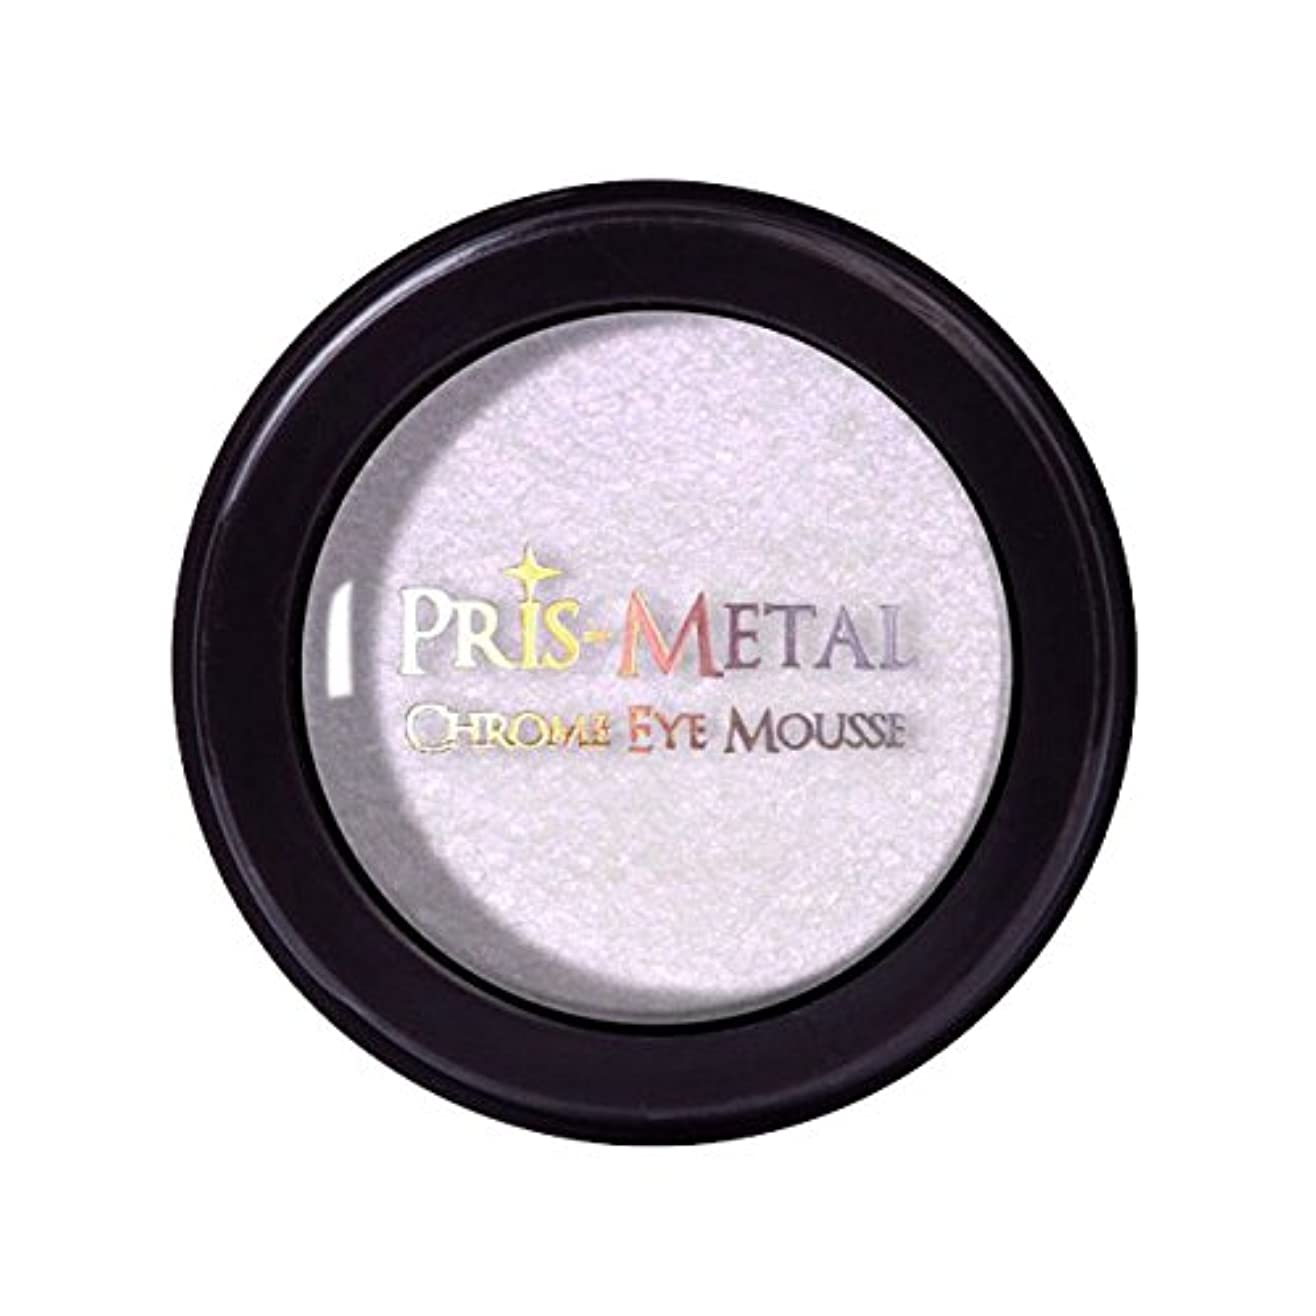 罪ボート消去(3 Pack) J. CAT BEAUTY Pris-Metal Chrome Eye Mousse - Pinky Promise (並行輸入品)